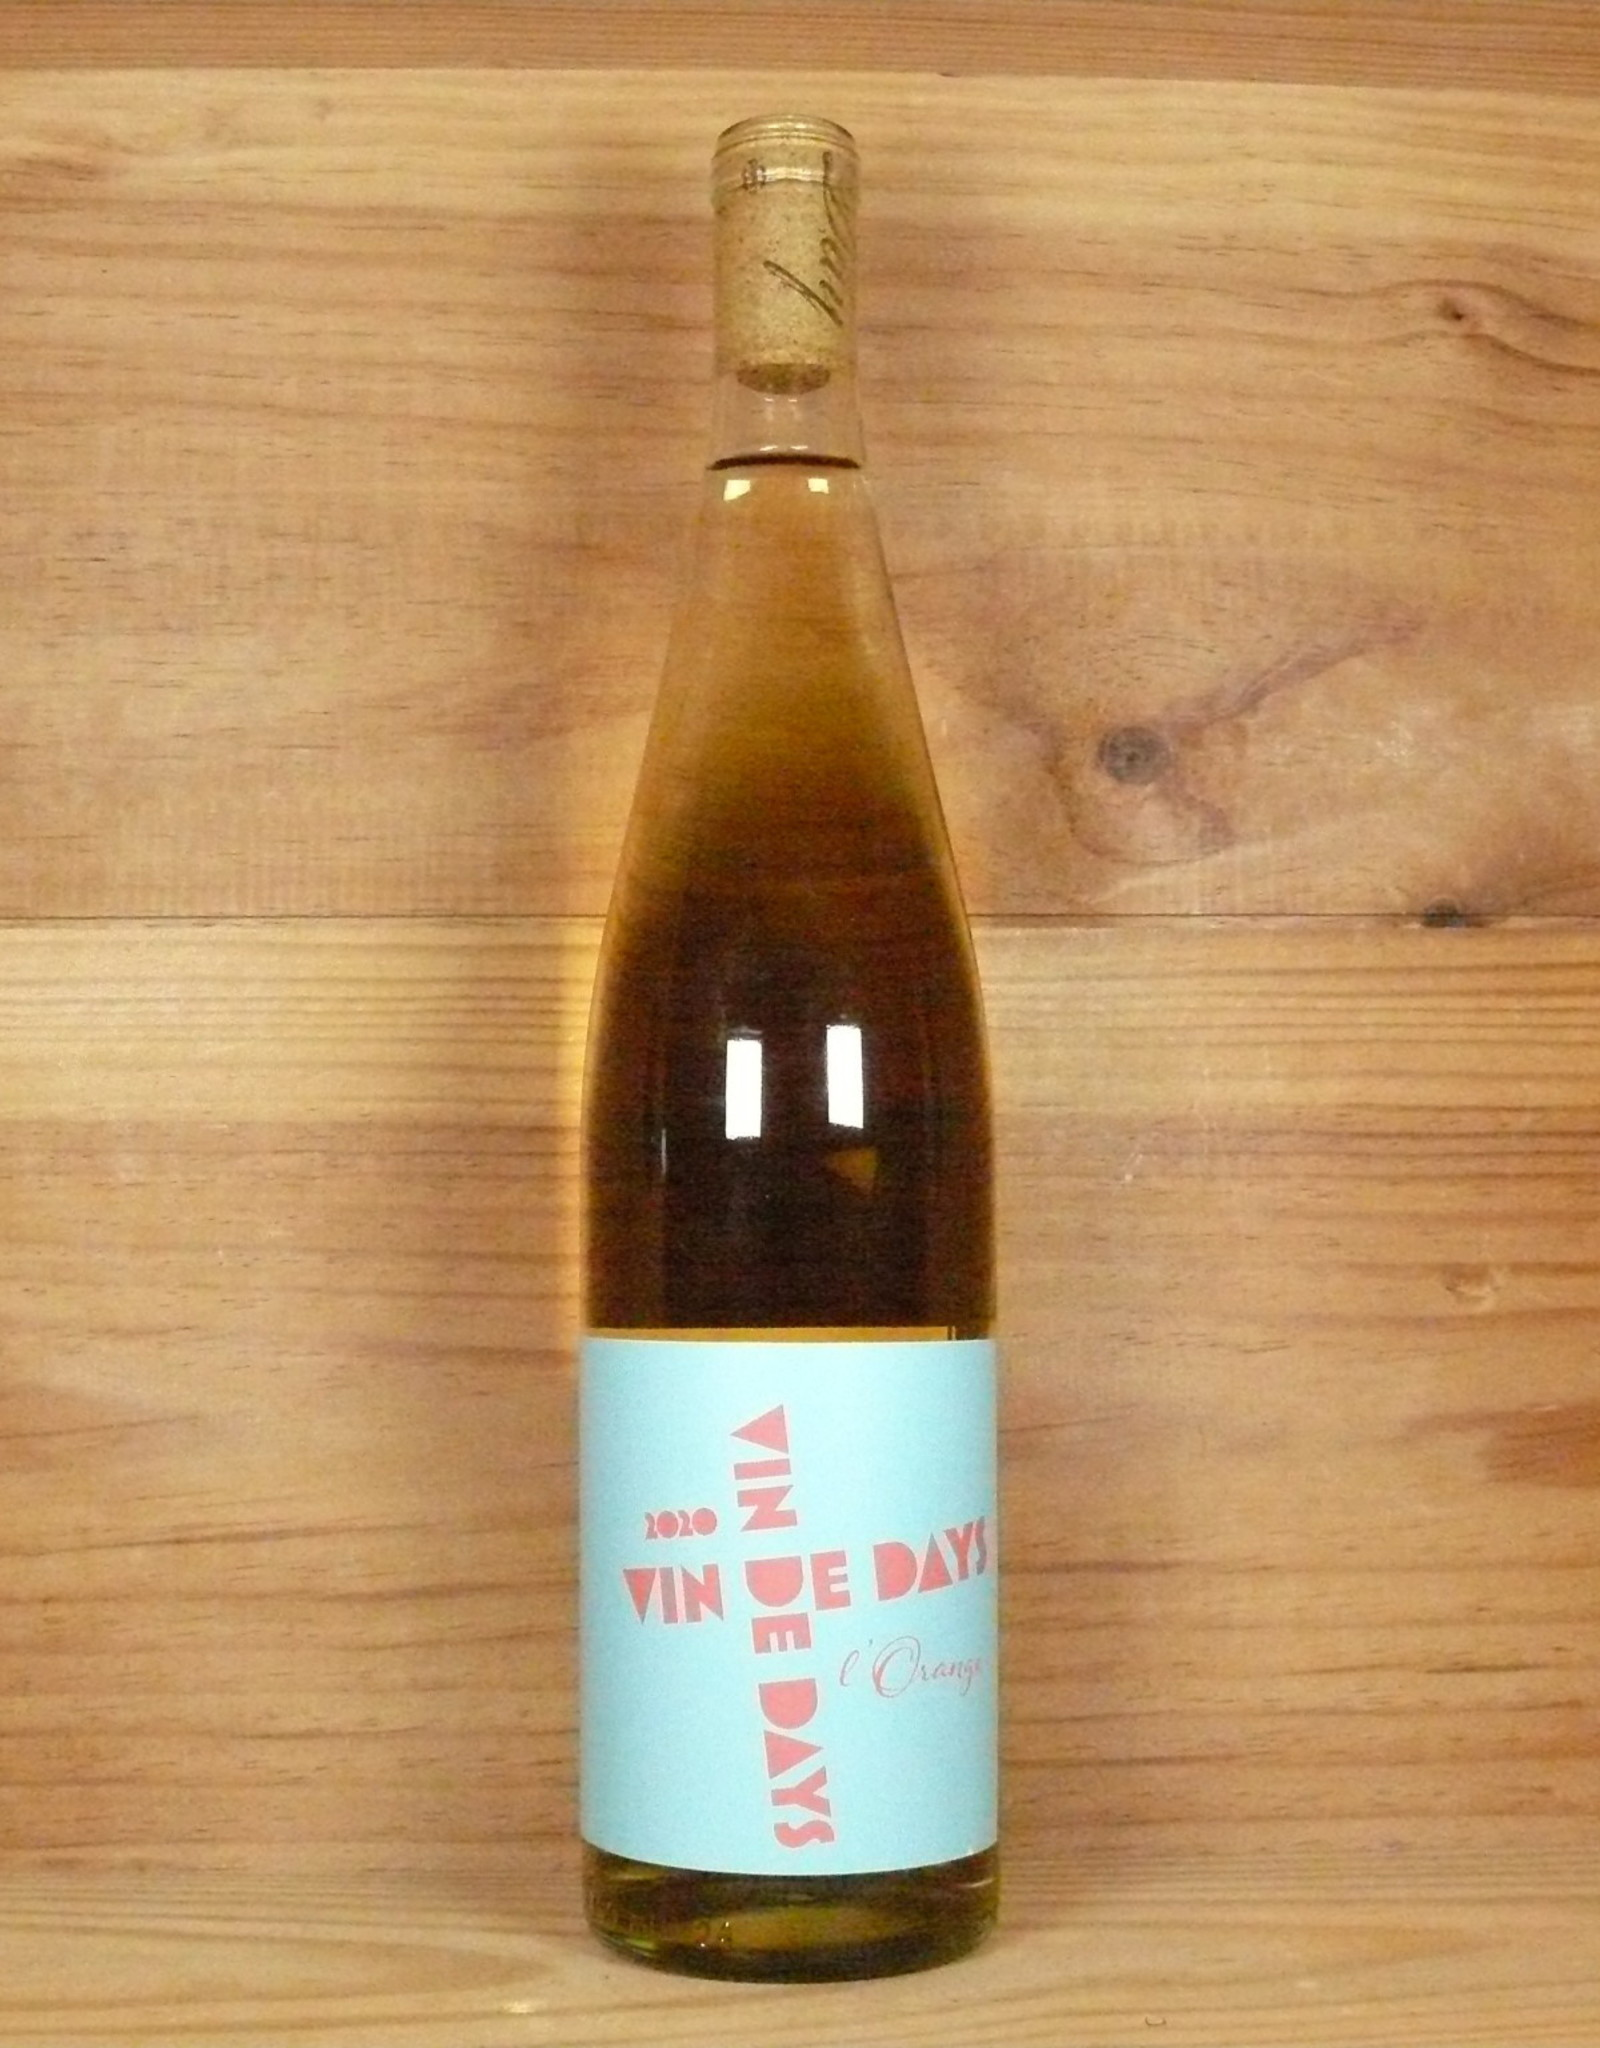 Day Wines - Vin de Days L'Orange 2020